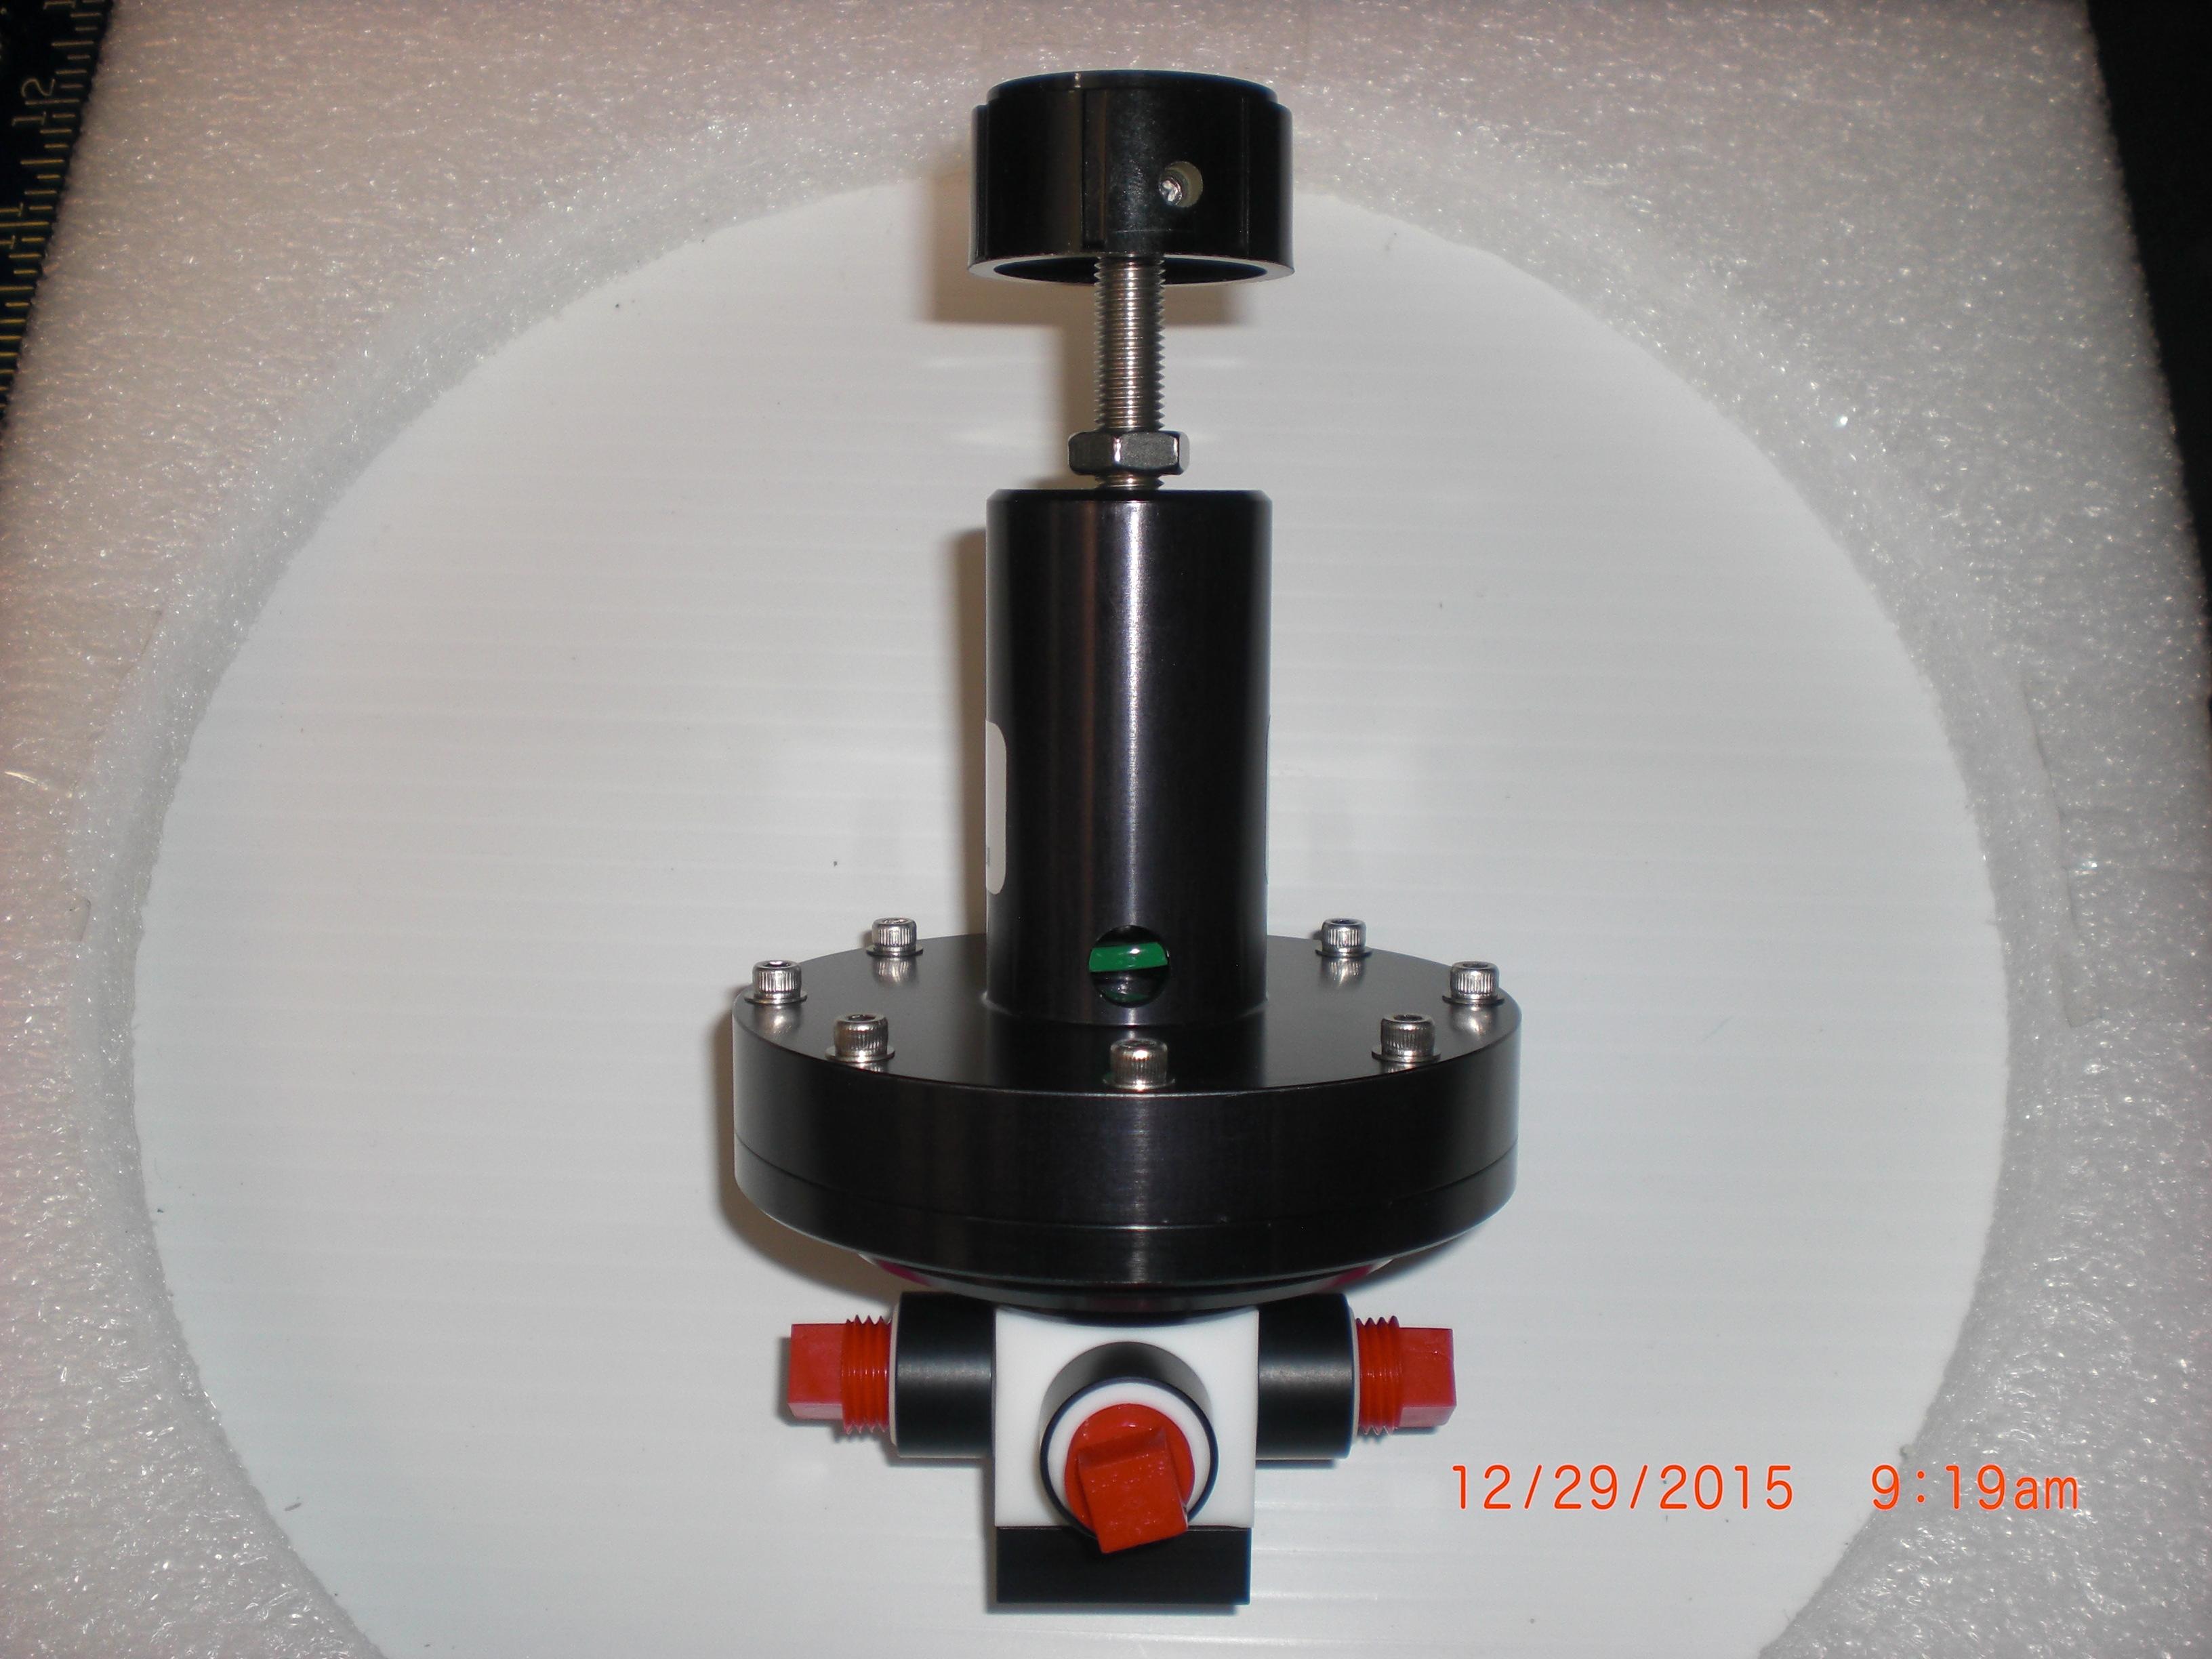 Regulator ENTEGRIS 972-11404-21   Teflon 0-30 PSI  1/4 FPT